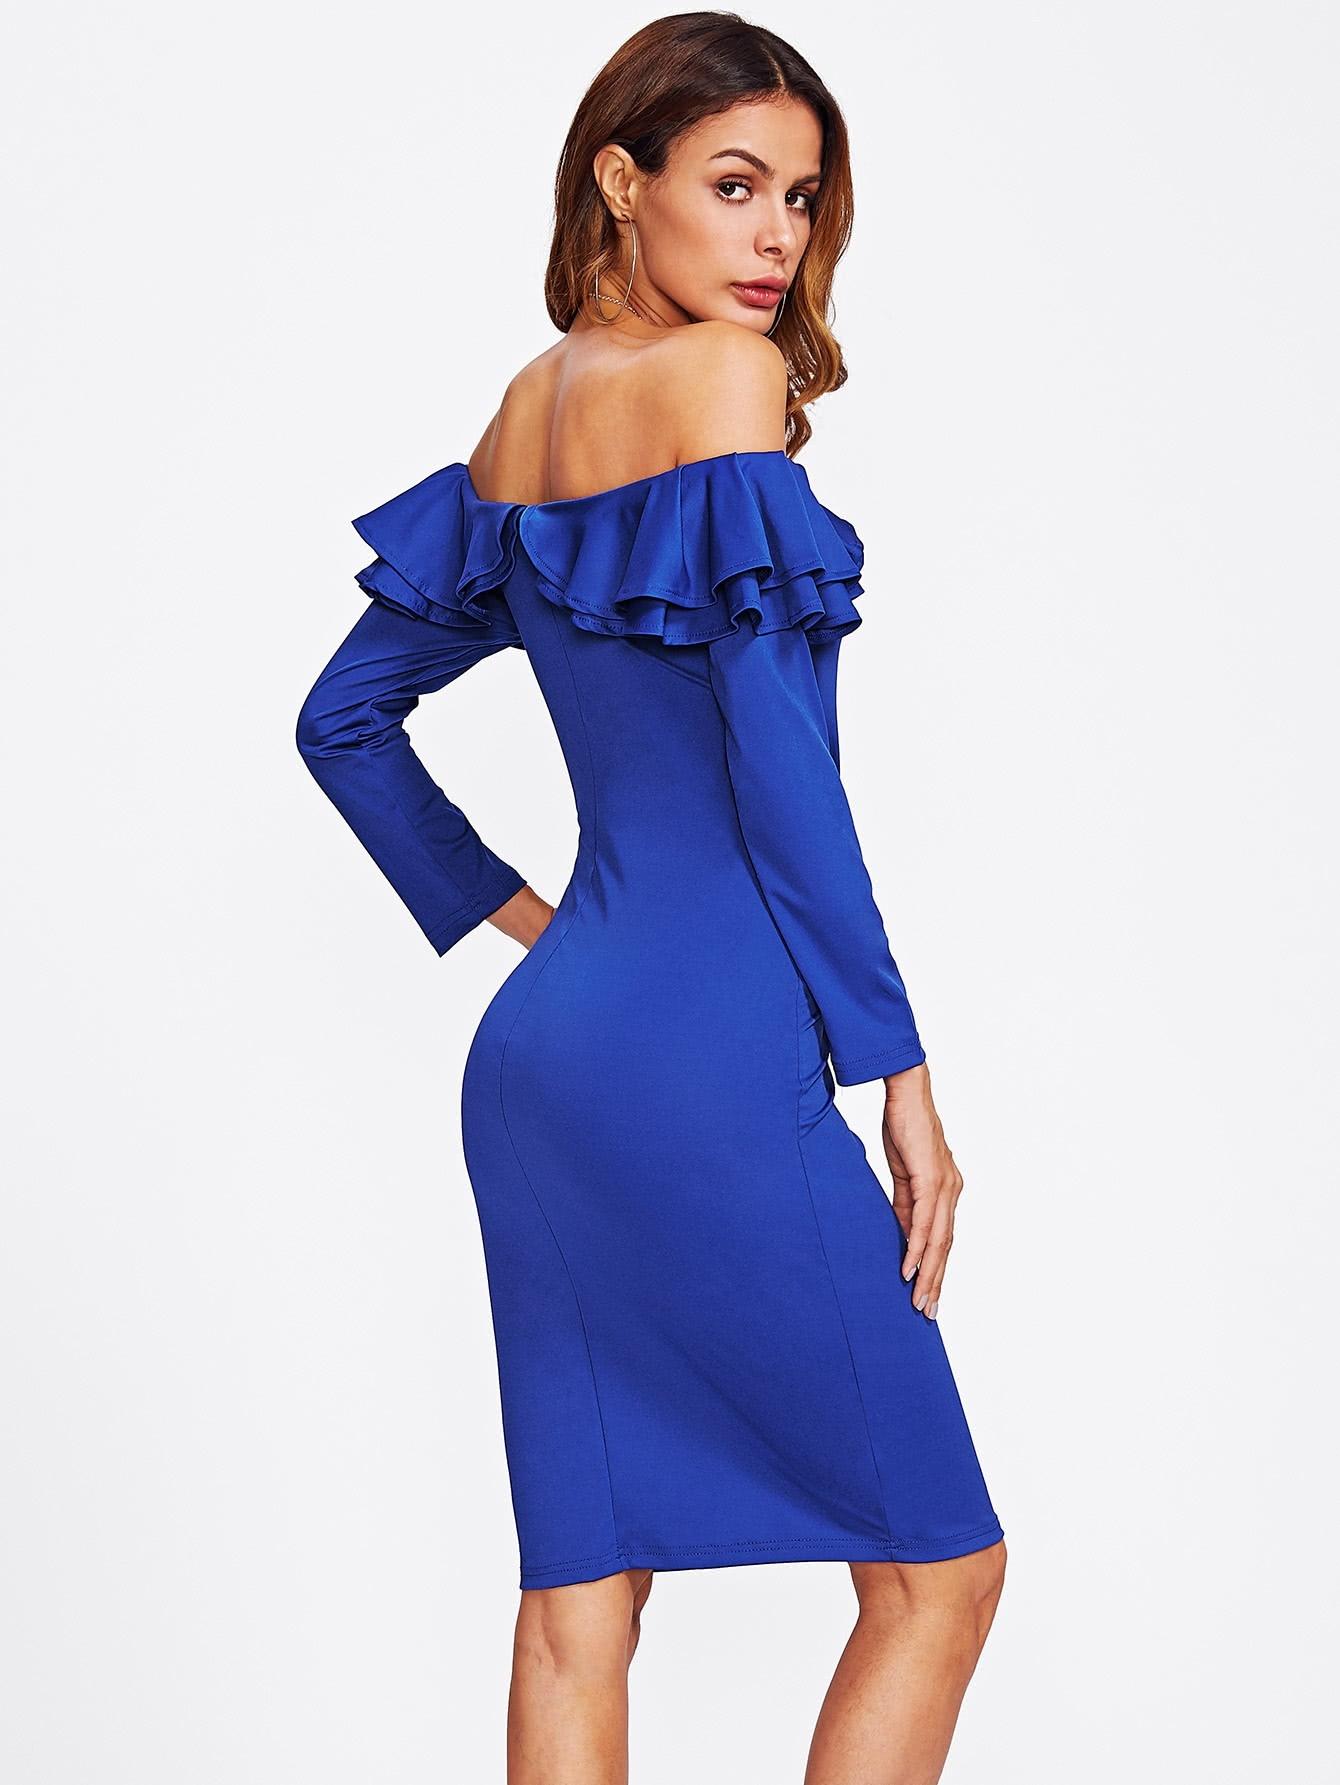 13 Perfekt Kleid Blau Langarm Stylish Schön Kleid Blau Langarm Boutique